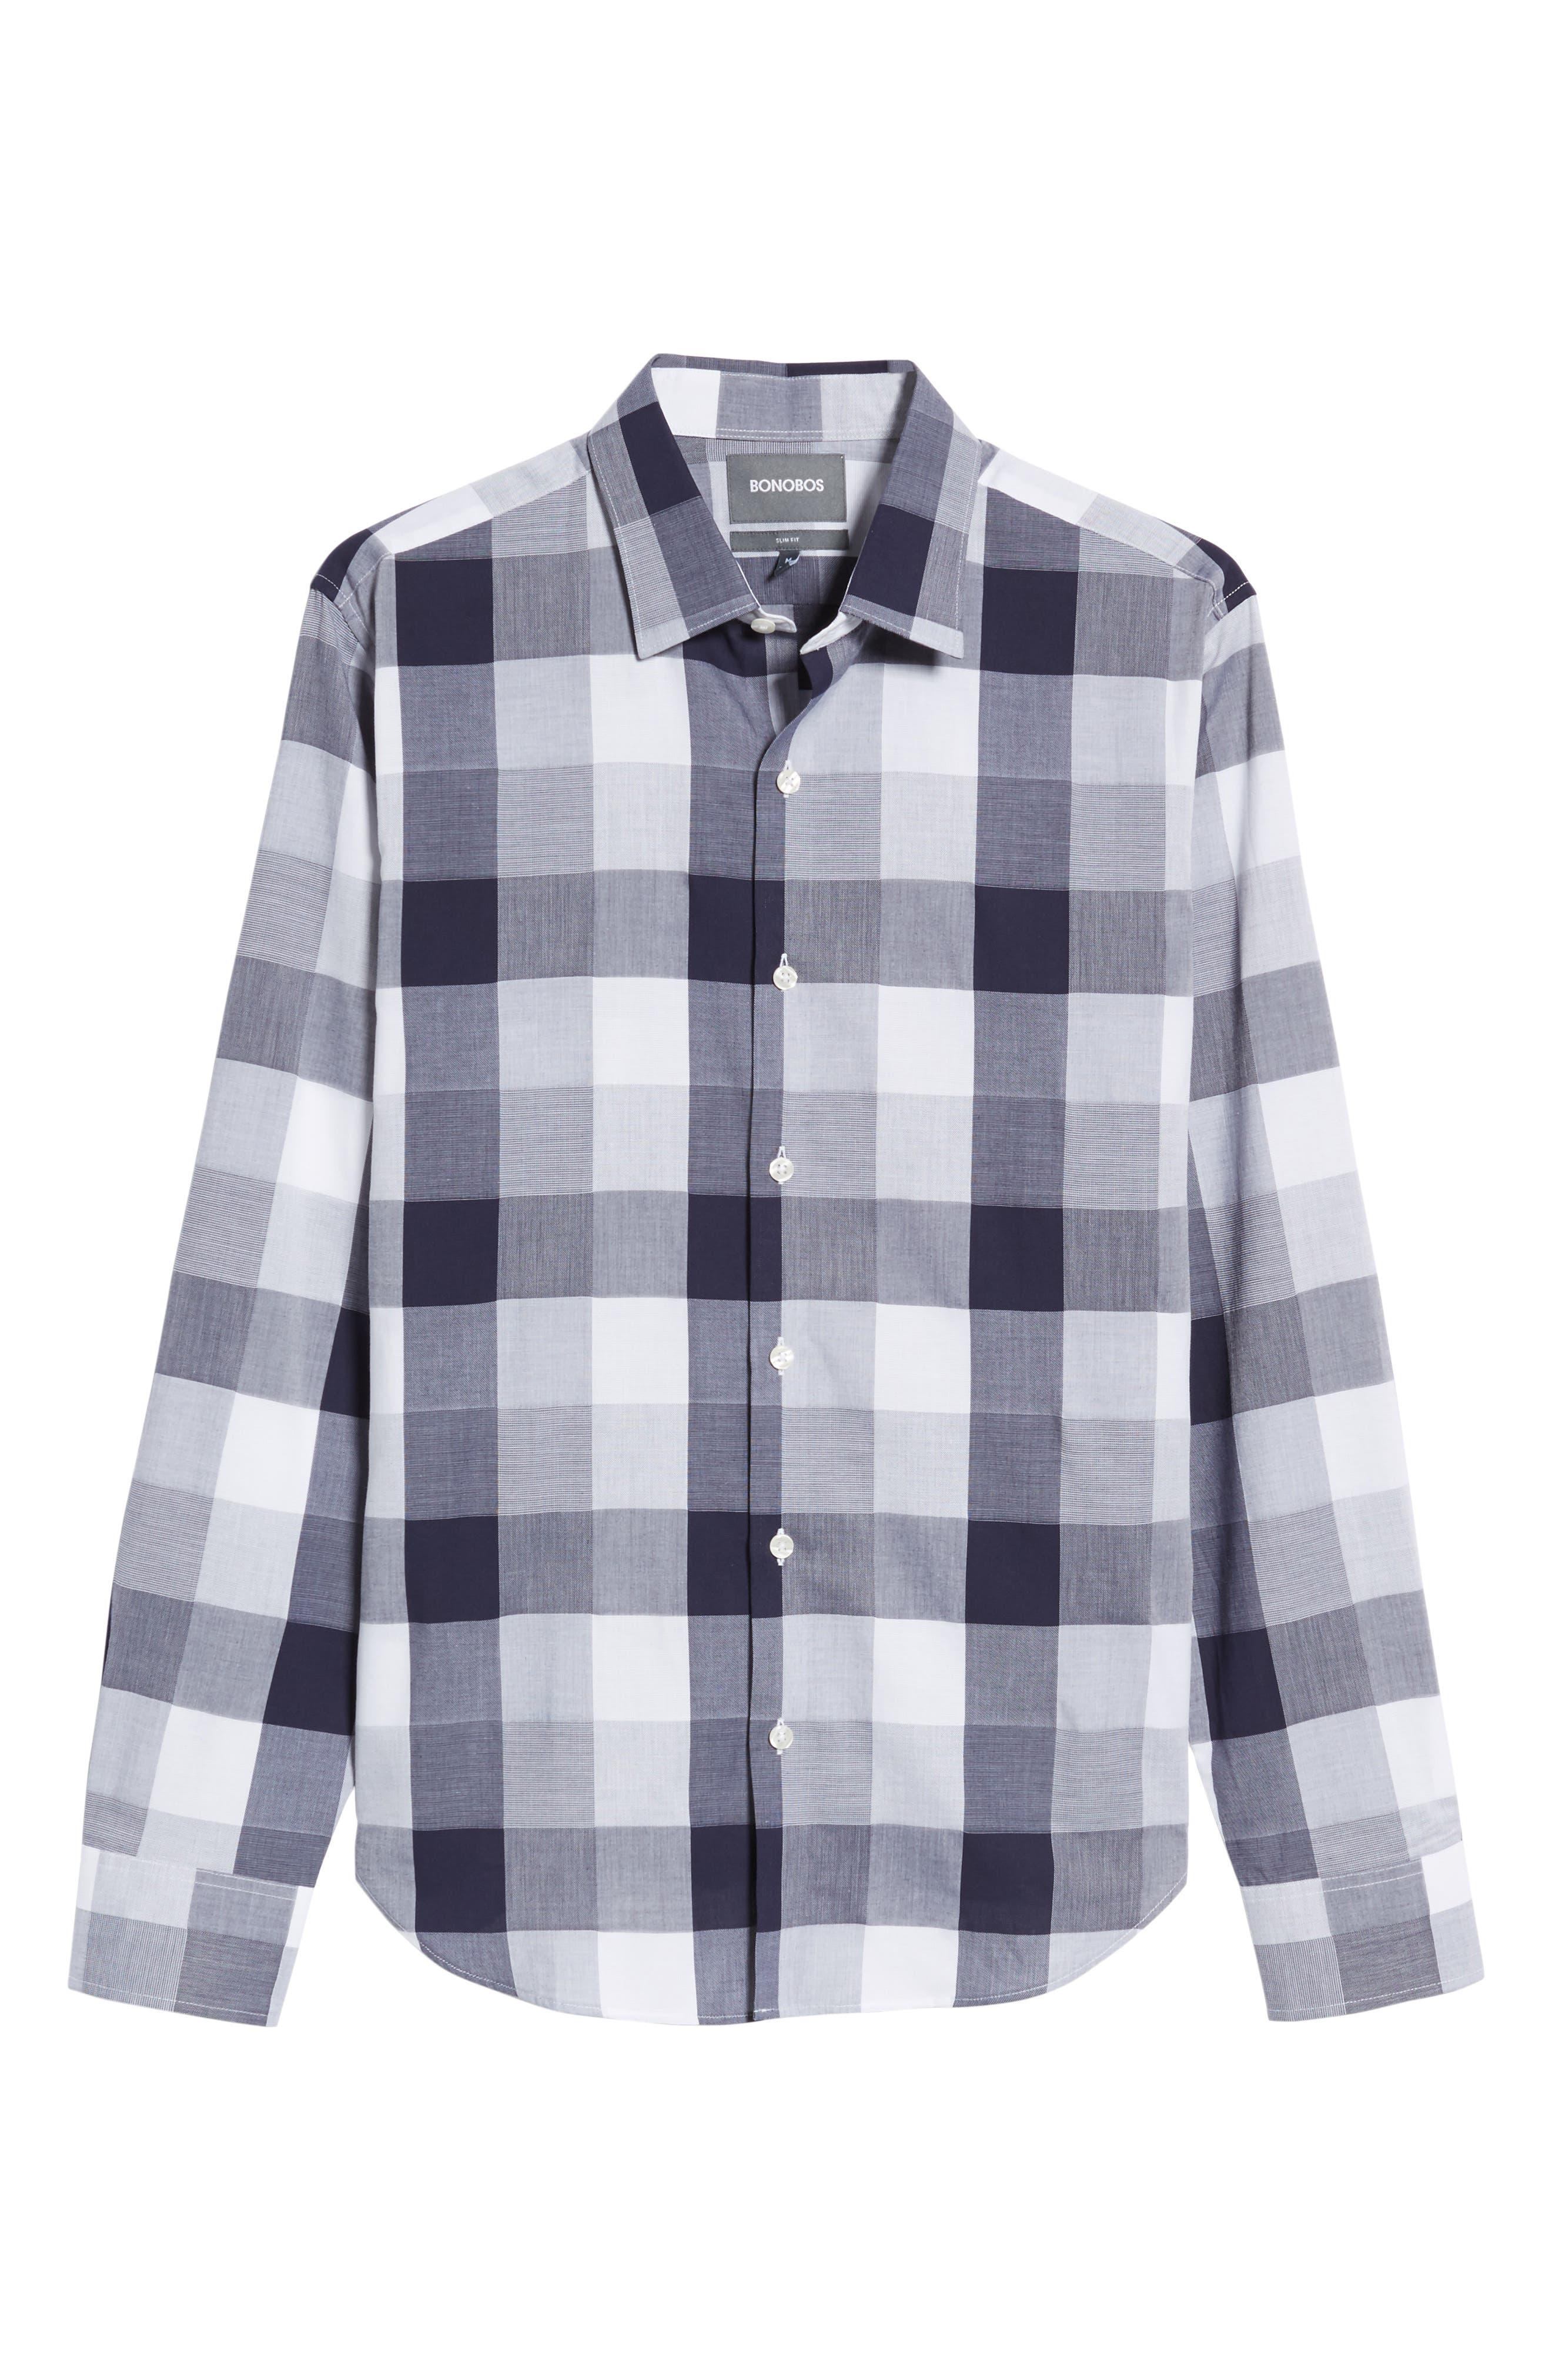 Unbutton Down 2.0 Slim Fit Buffalo Check Sport Shirt,                             Alternate thumbnail 6, color,                             Thomas Check - Maritime Blue